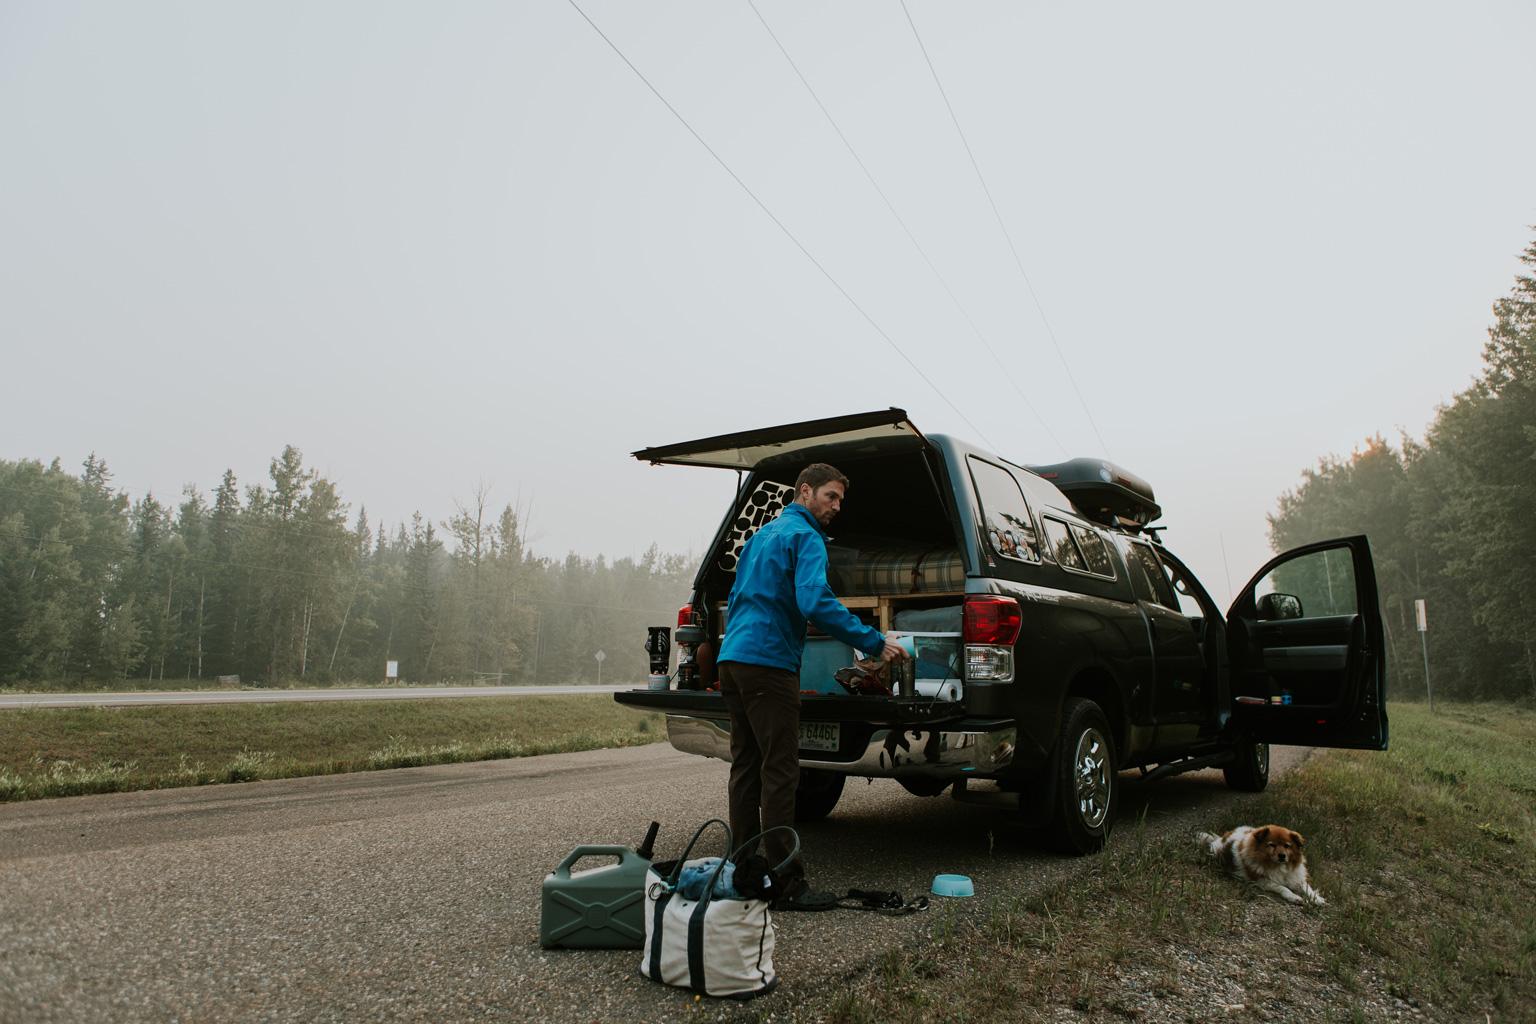 CindyGiovagnoli_BritishColumbia_Yukon_Alaska_roadtrip_AlCan_Alaskan_Highway_truck_camping-012.jpg